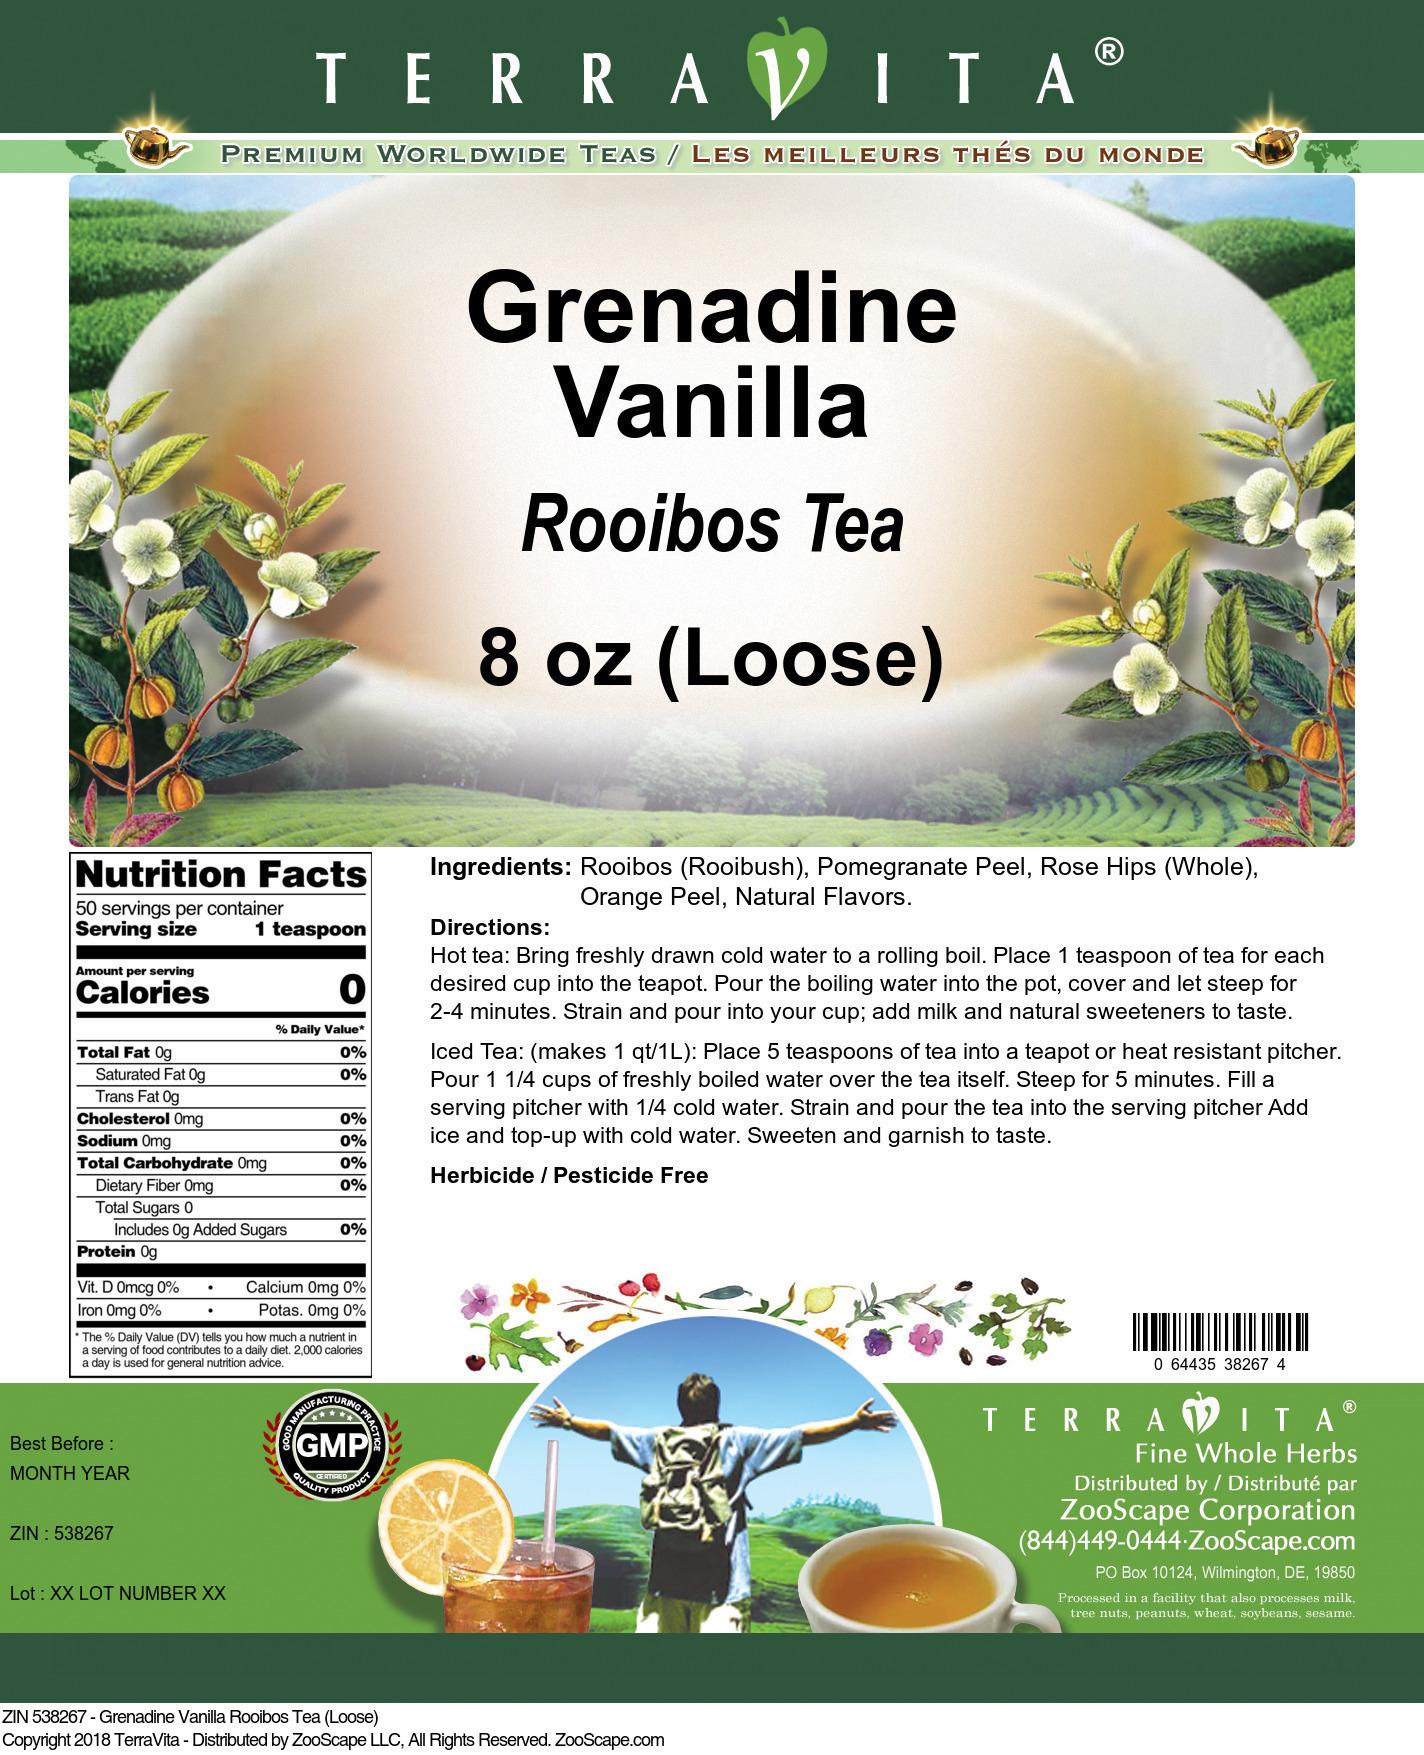 Grenadine Vanilla Rooibos Tea (Loose)